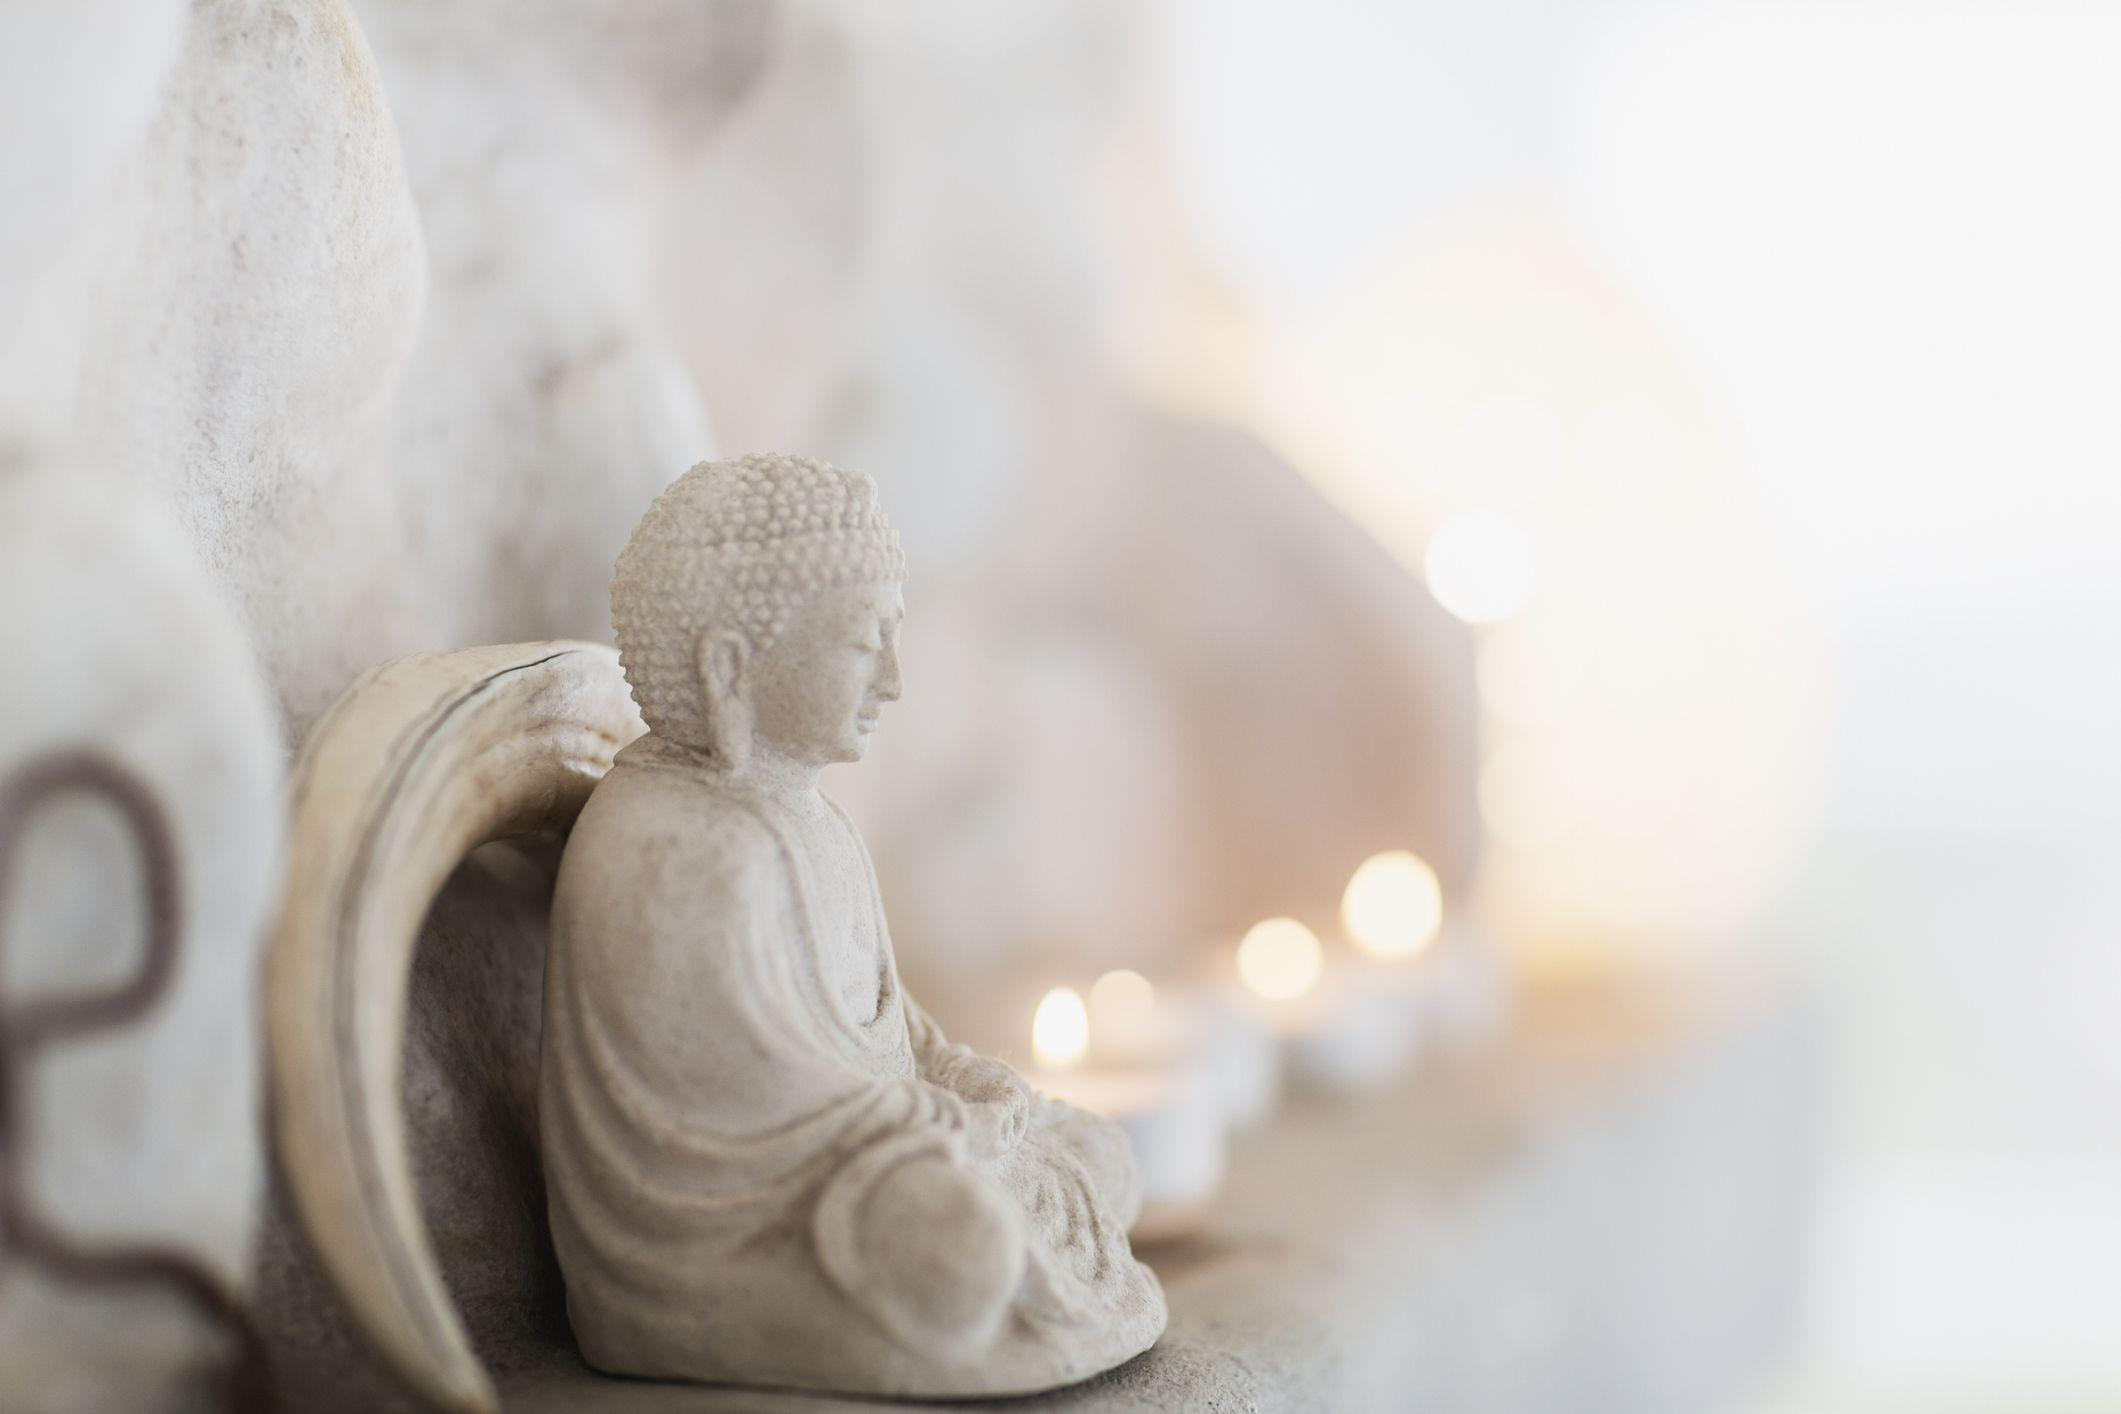 White Buddha statue with tea lights